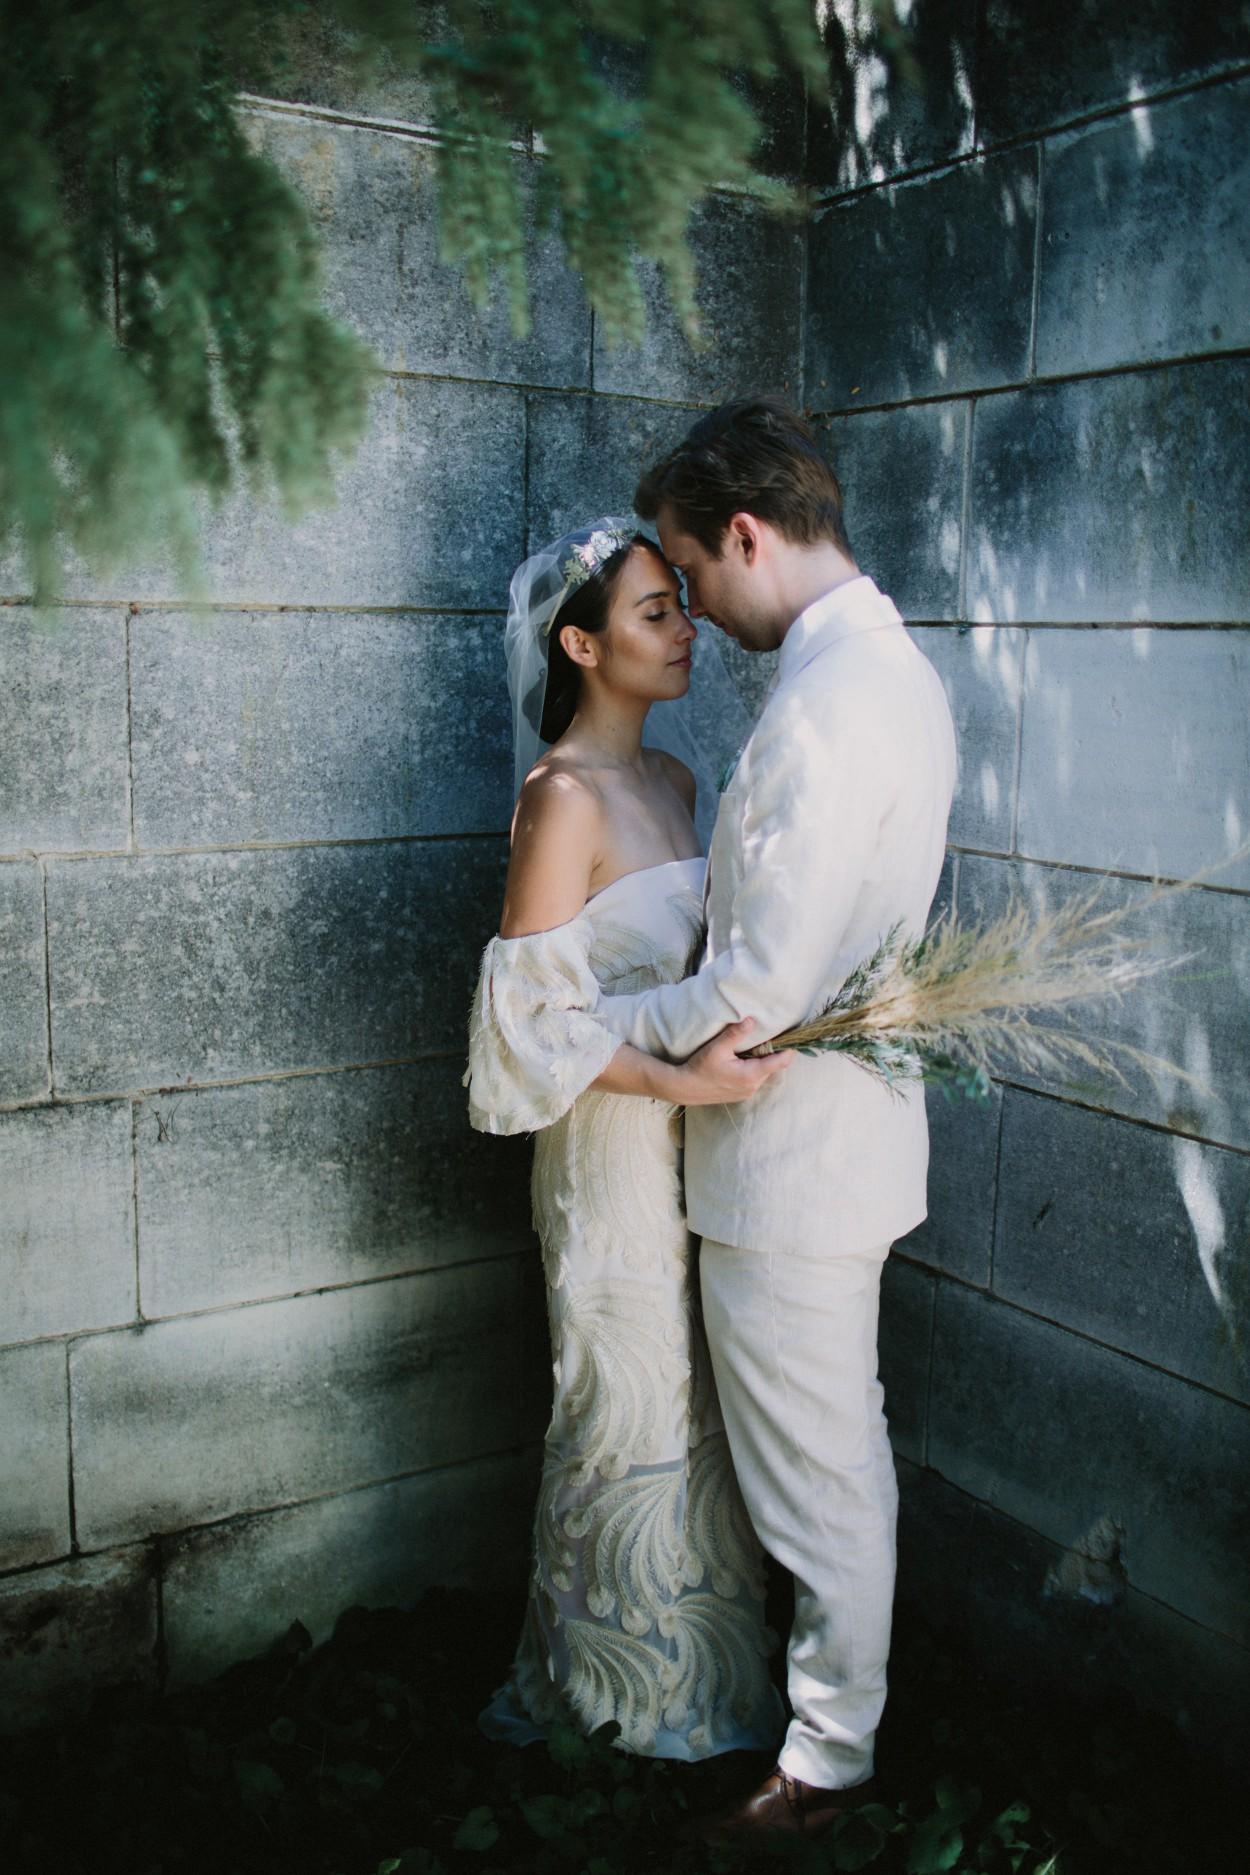 I-Got-You-Babe-Weddings-Heide-Museum-of-Modern-Art-Elopement-Susie-Nathan089.jpg